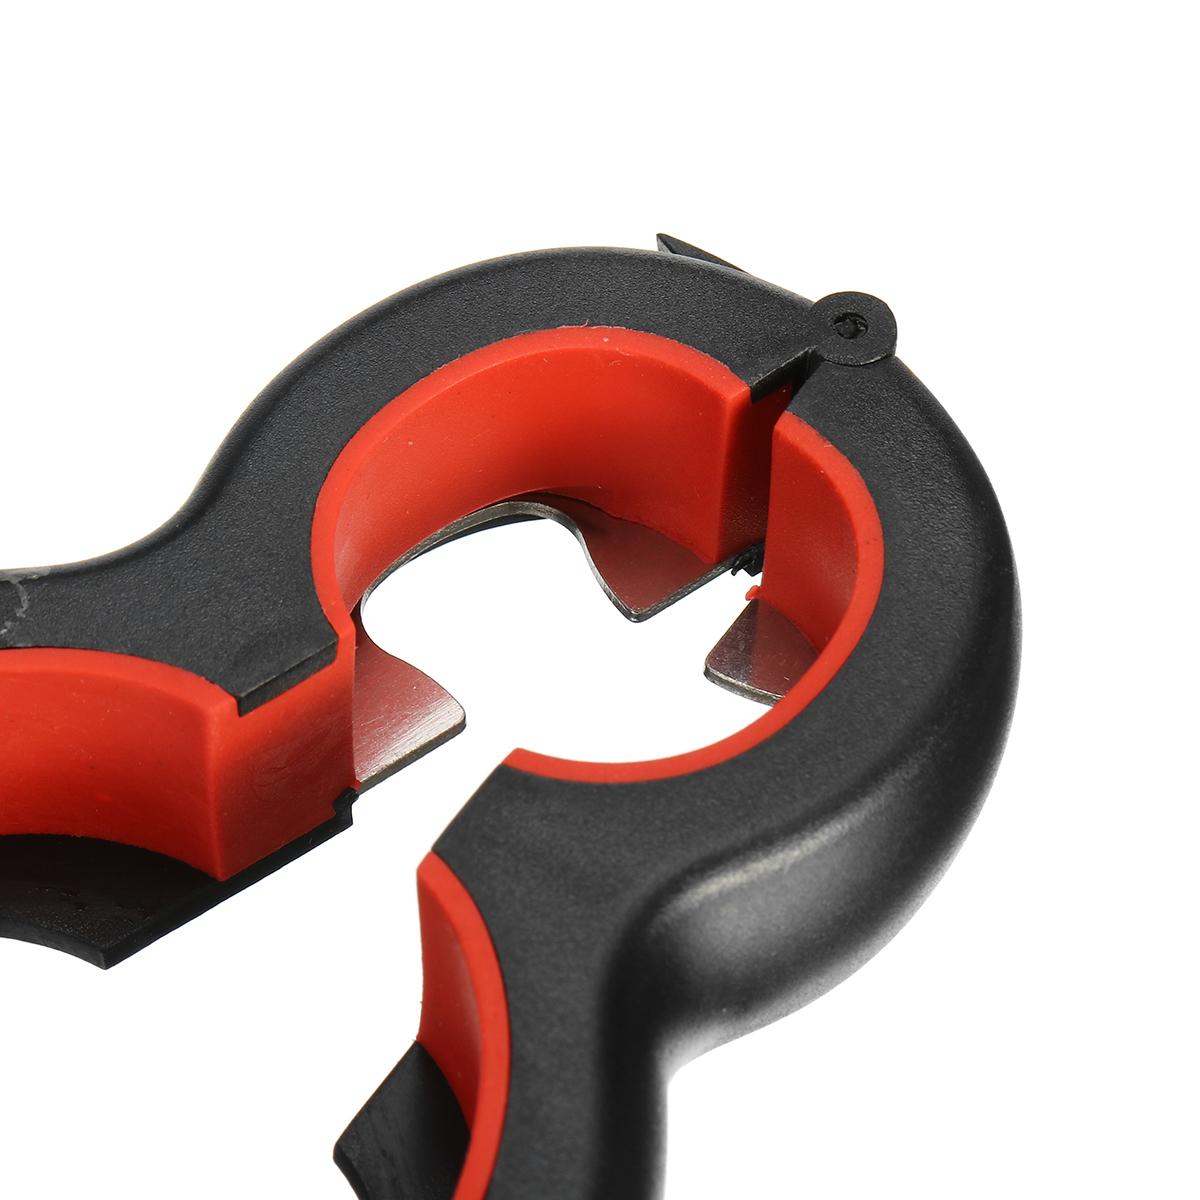 6 in 1 Can Opener Multi Purpose Screw Cap Bottle Openers Jar Lid Grip Kitchen Tool